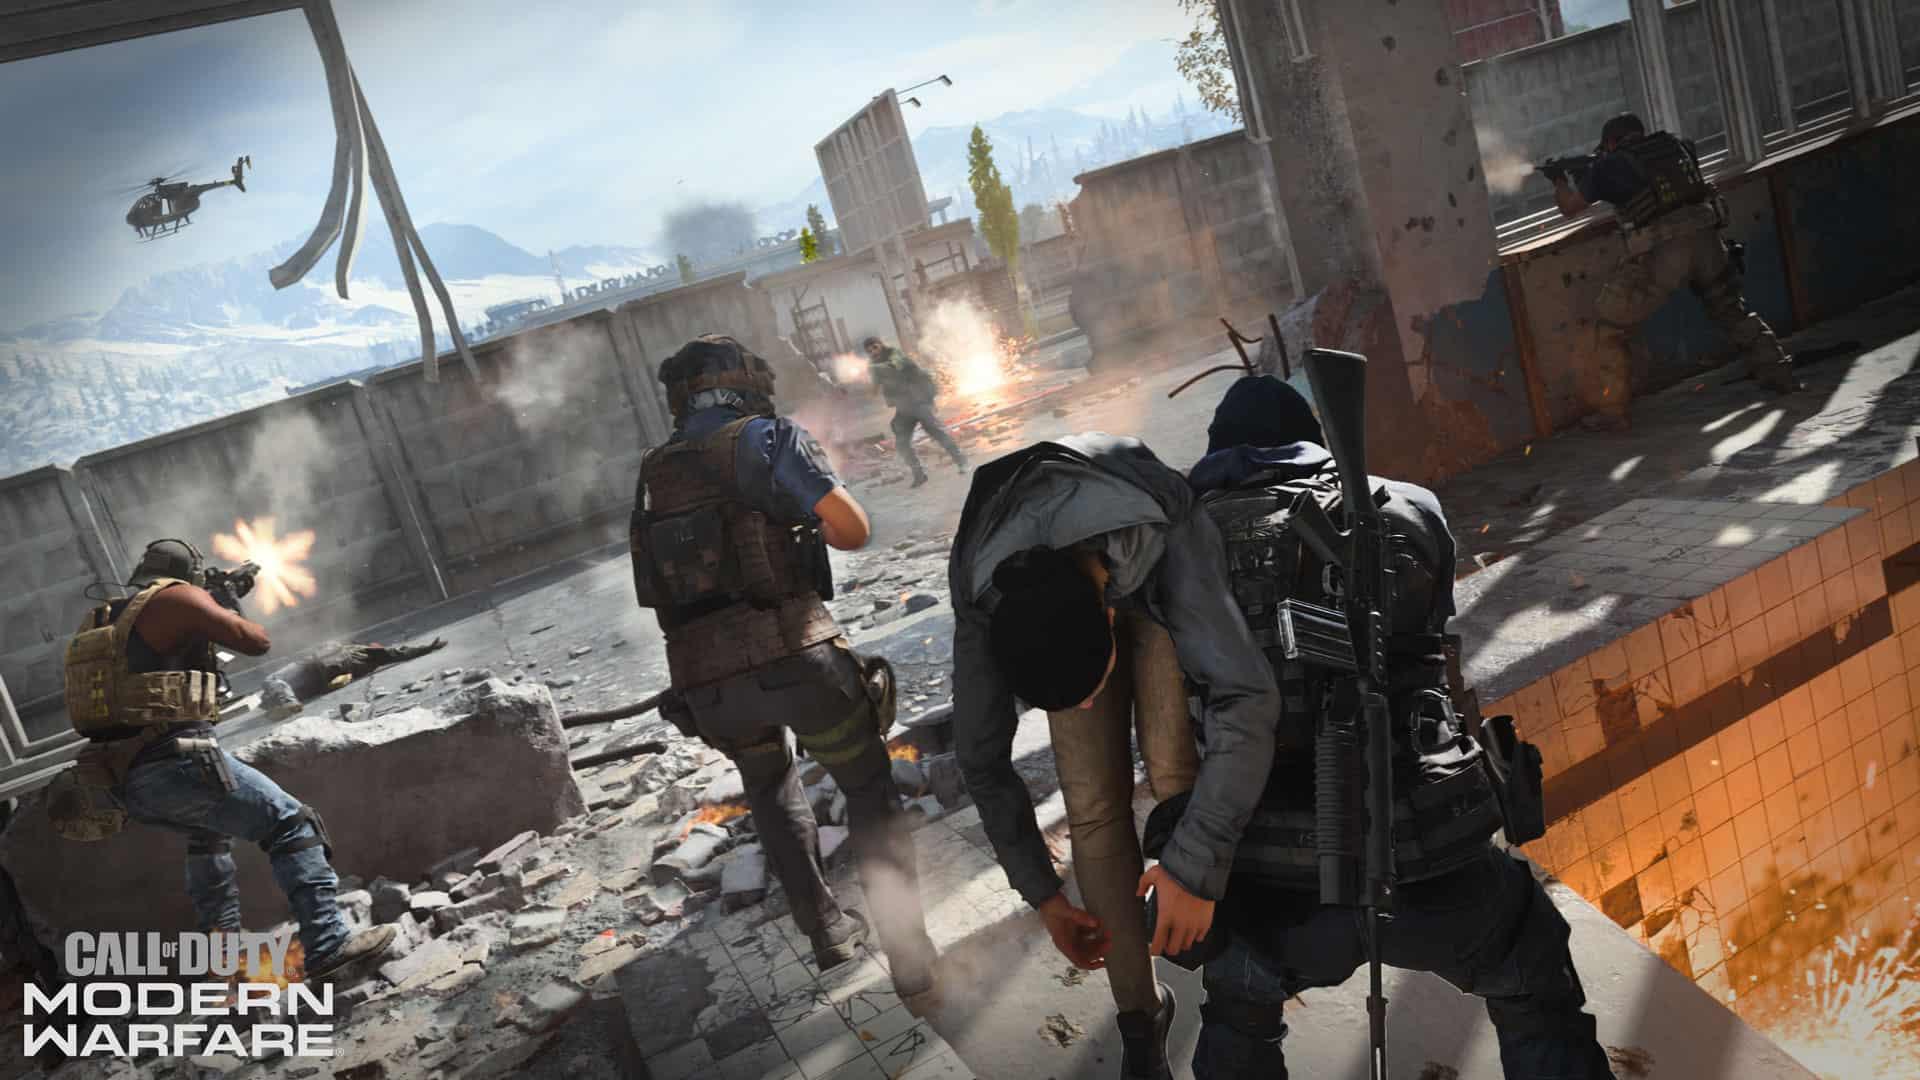 Call Of Duty: Modern Warfare Available Now Worldwide